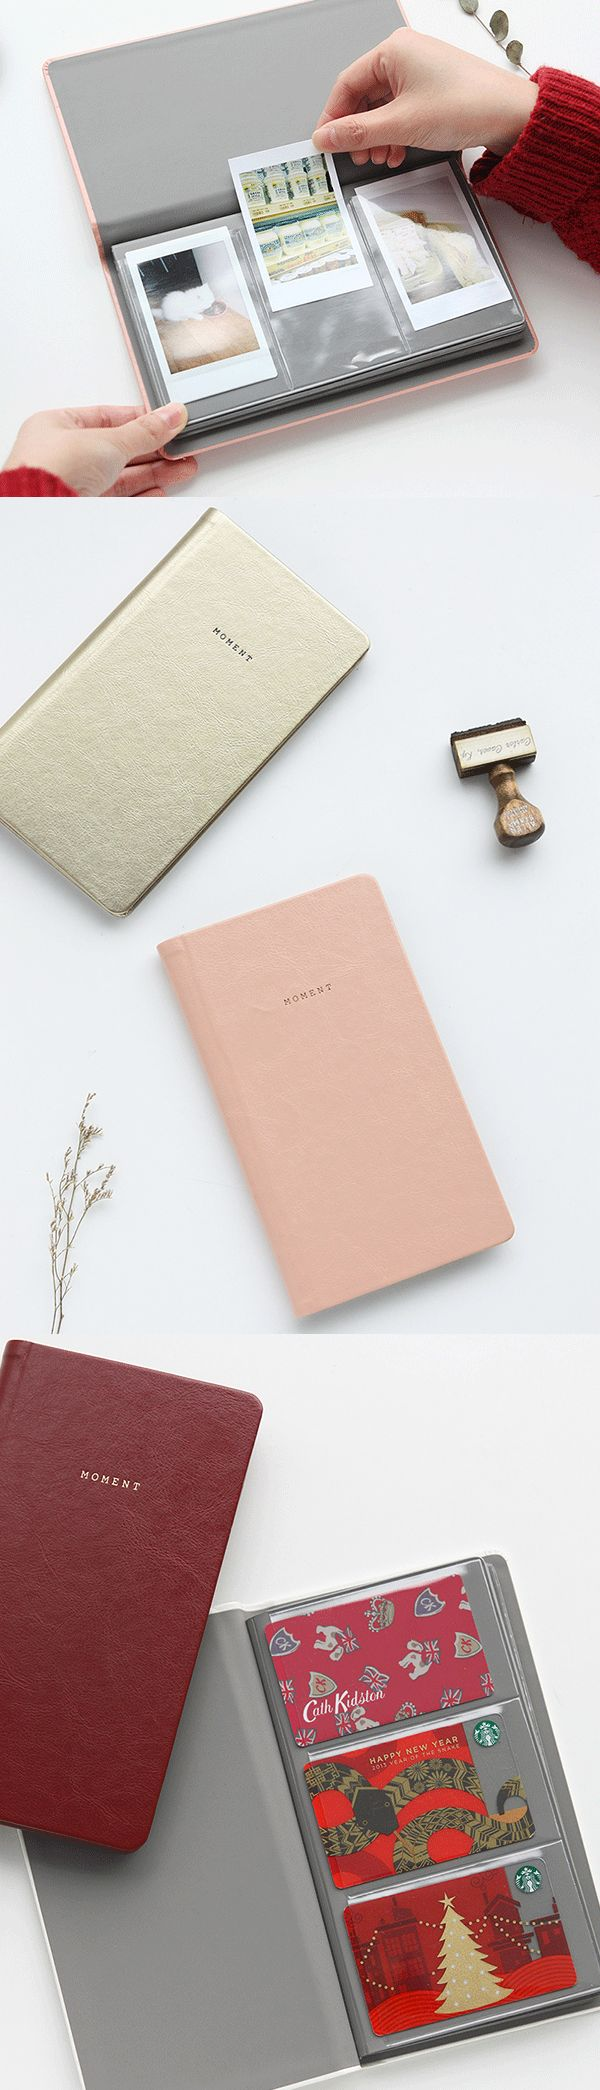 Best 25+ Gift cards ideas on Pinterest | Gift card store, Forever ...